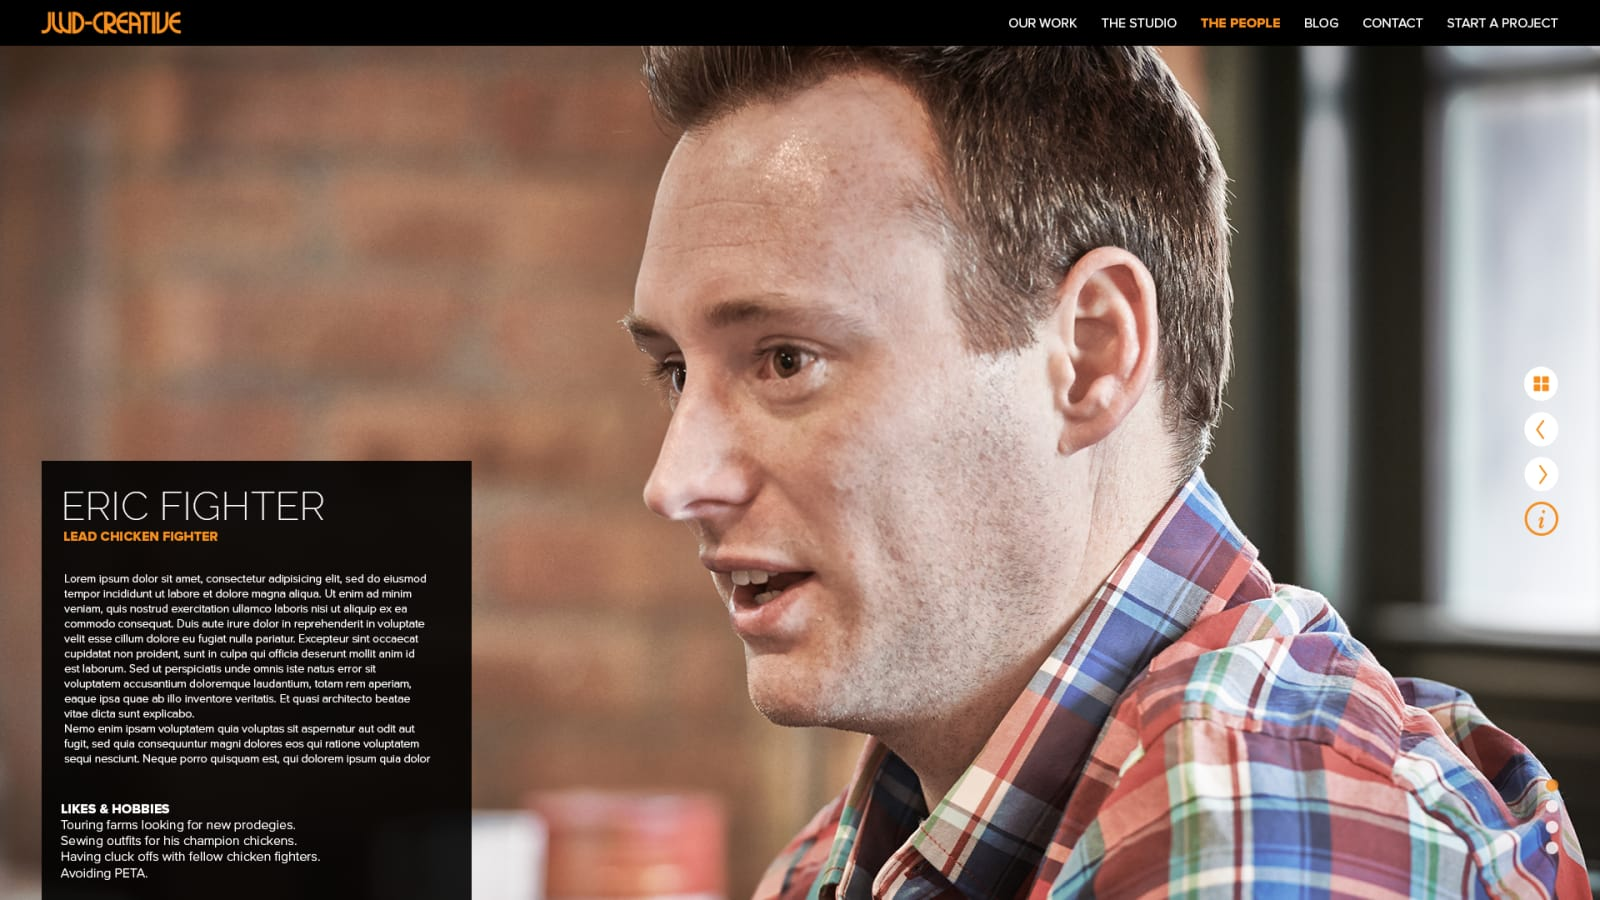 JWD Creative Person Page